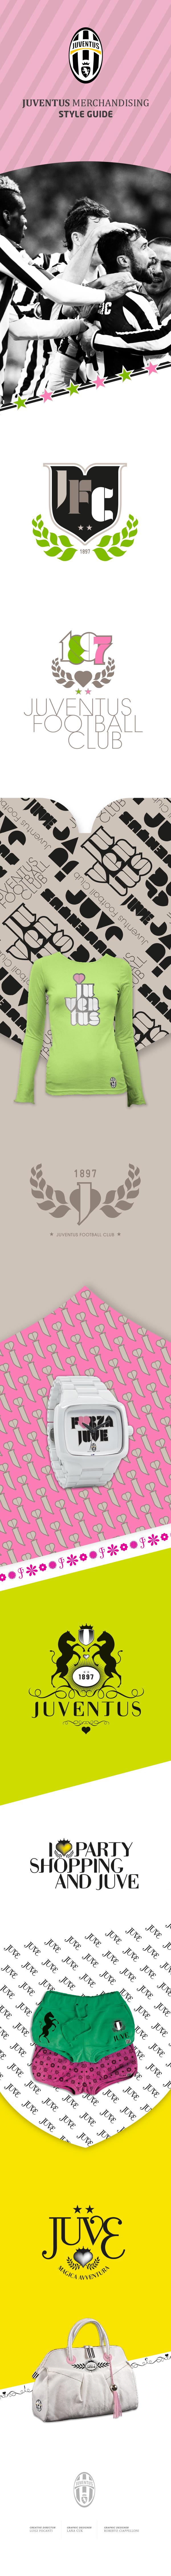 Juventus Style Guide Stile Woman